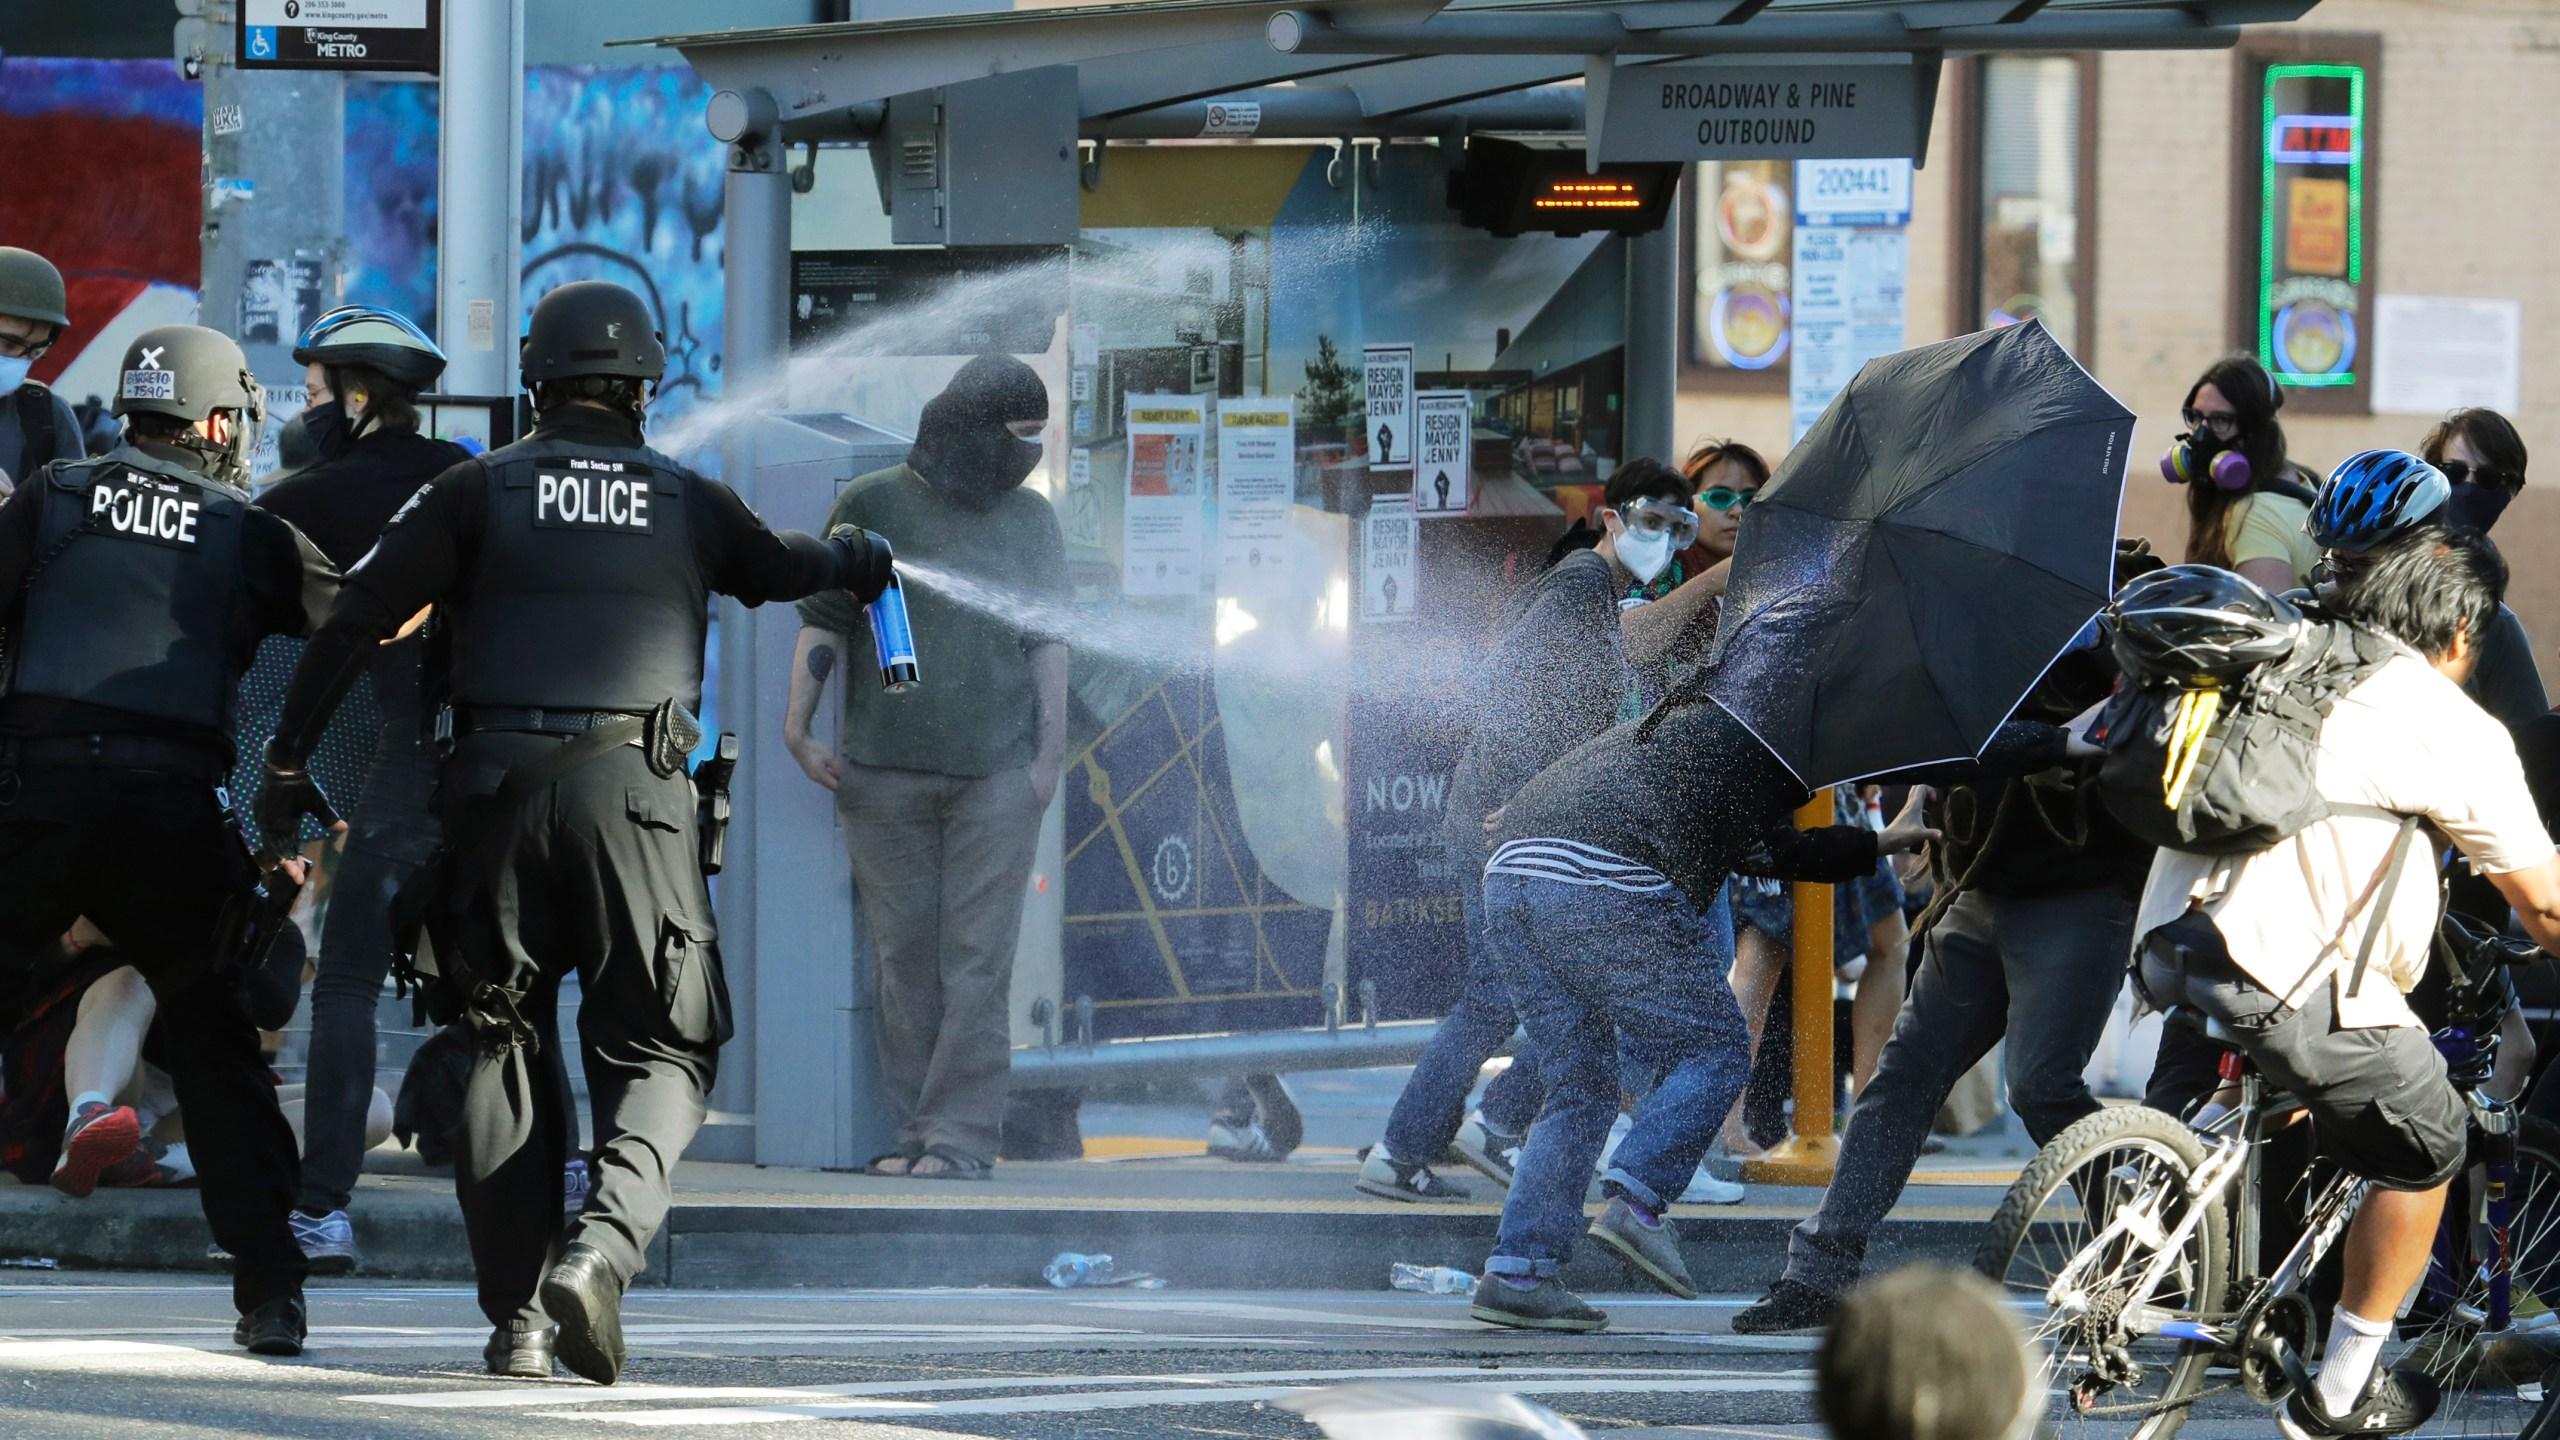 Police reform legislation